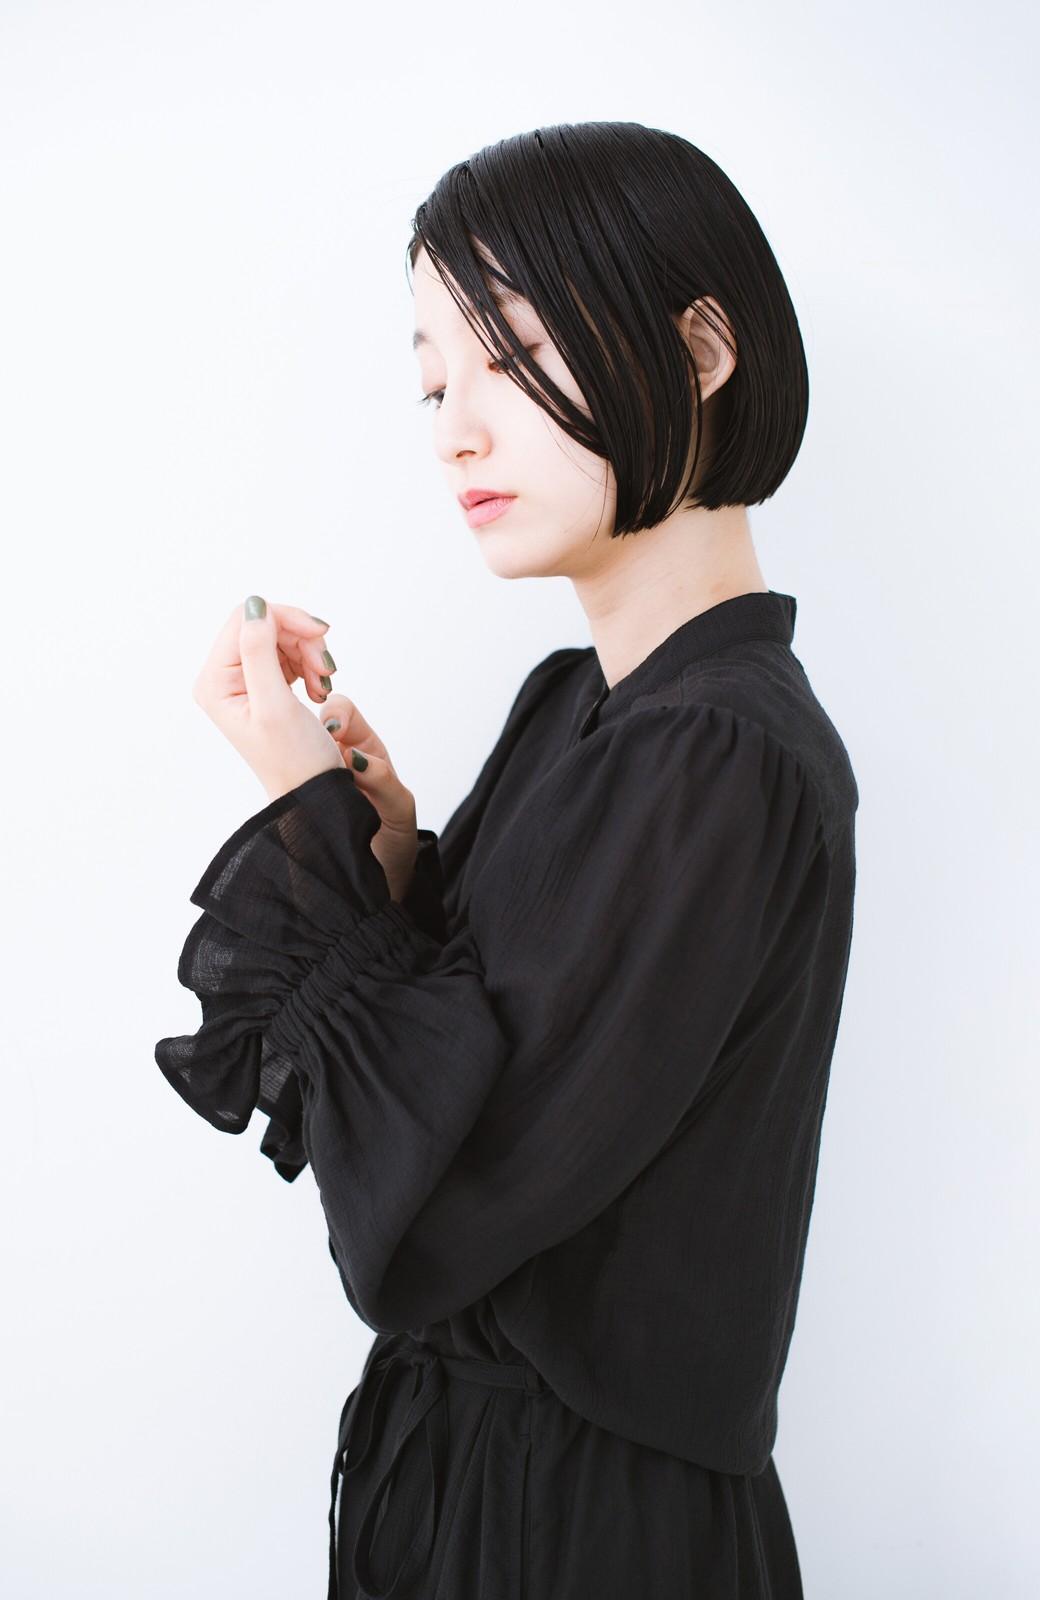 haco! 太ってもばれず 羽織っても便利なウエストリボンワンピース <ブラック>の商品写真20